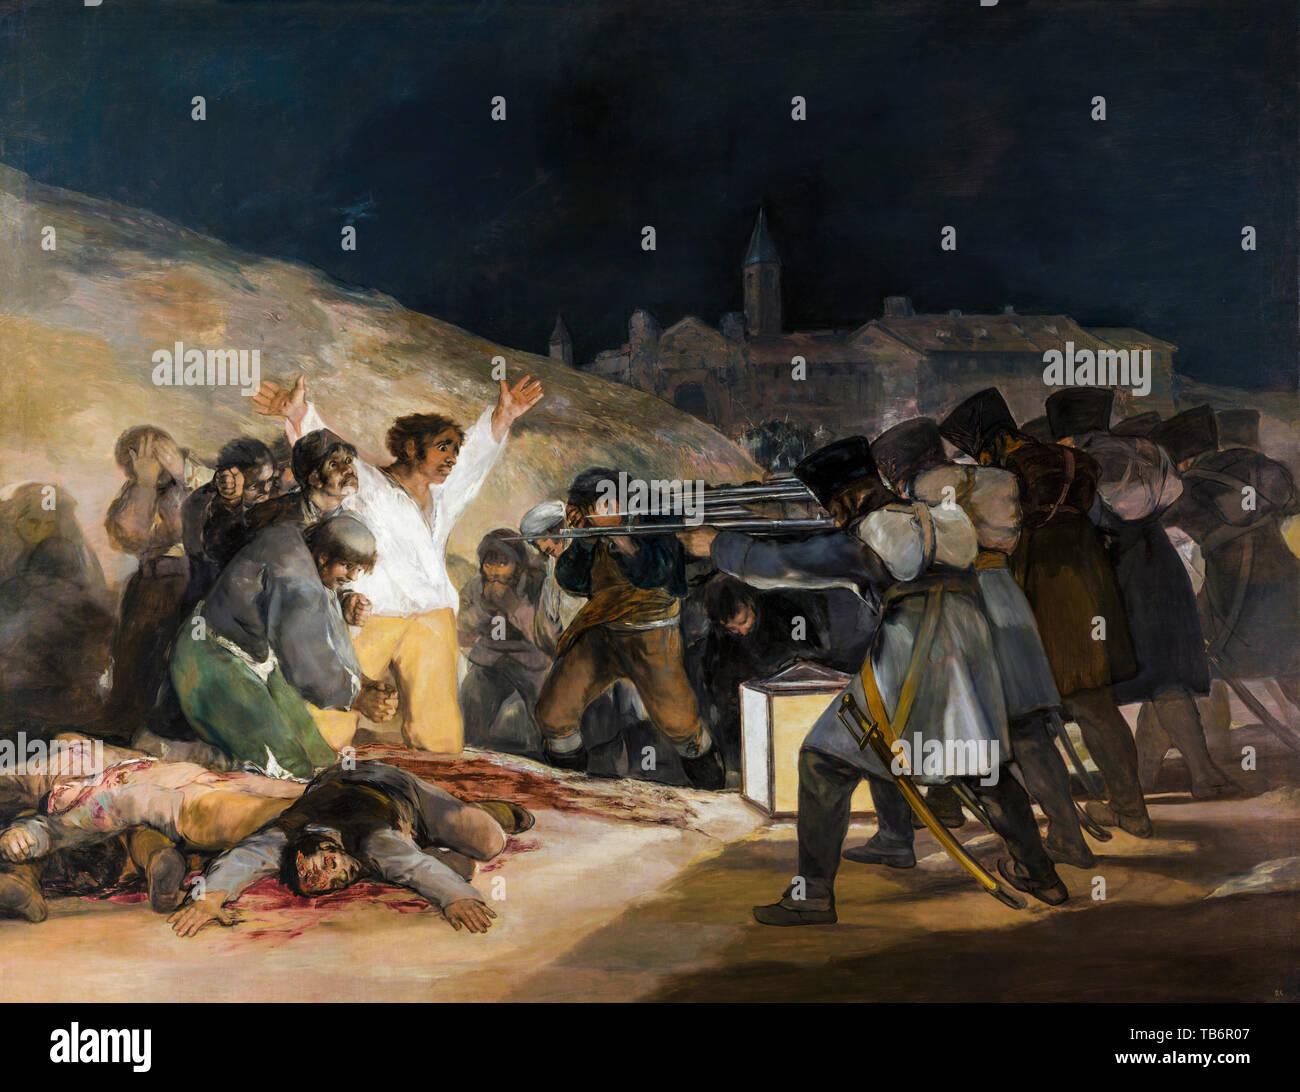 Francisco Goya, The Third of May 1808, painting, 1814 - Stock Image